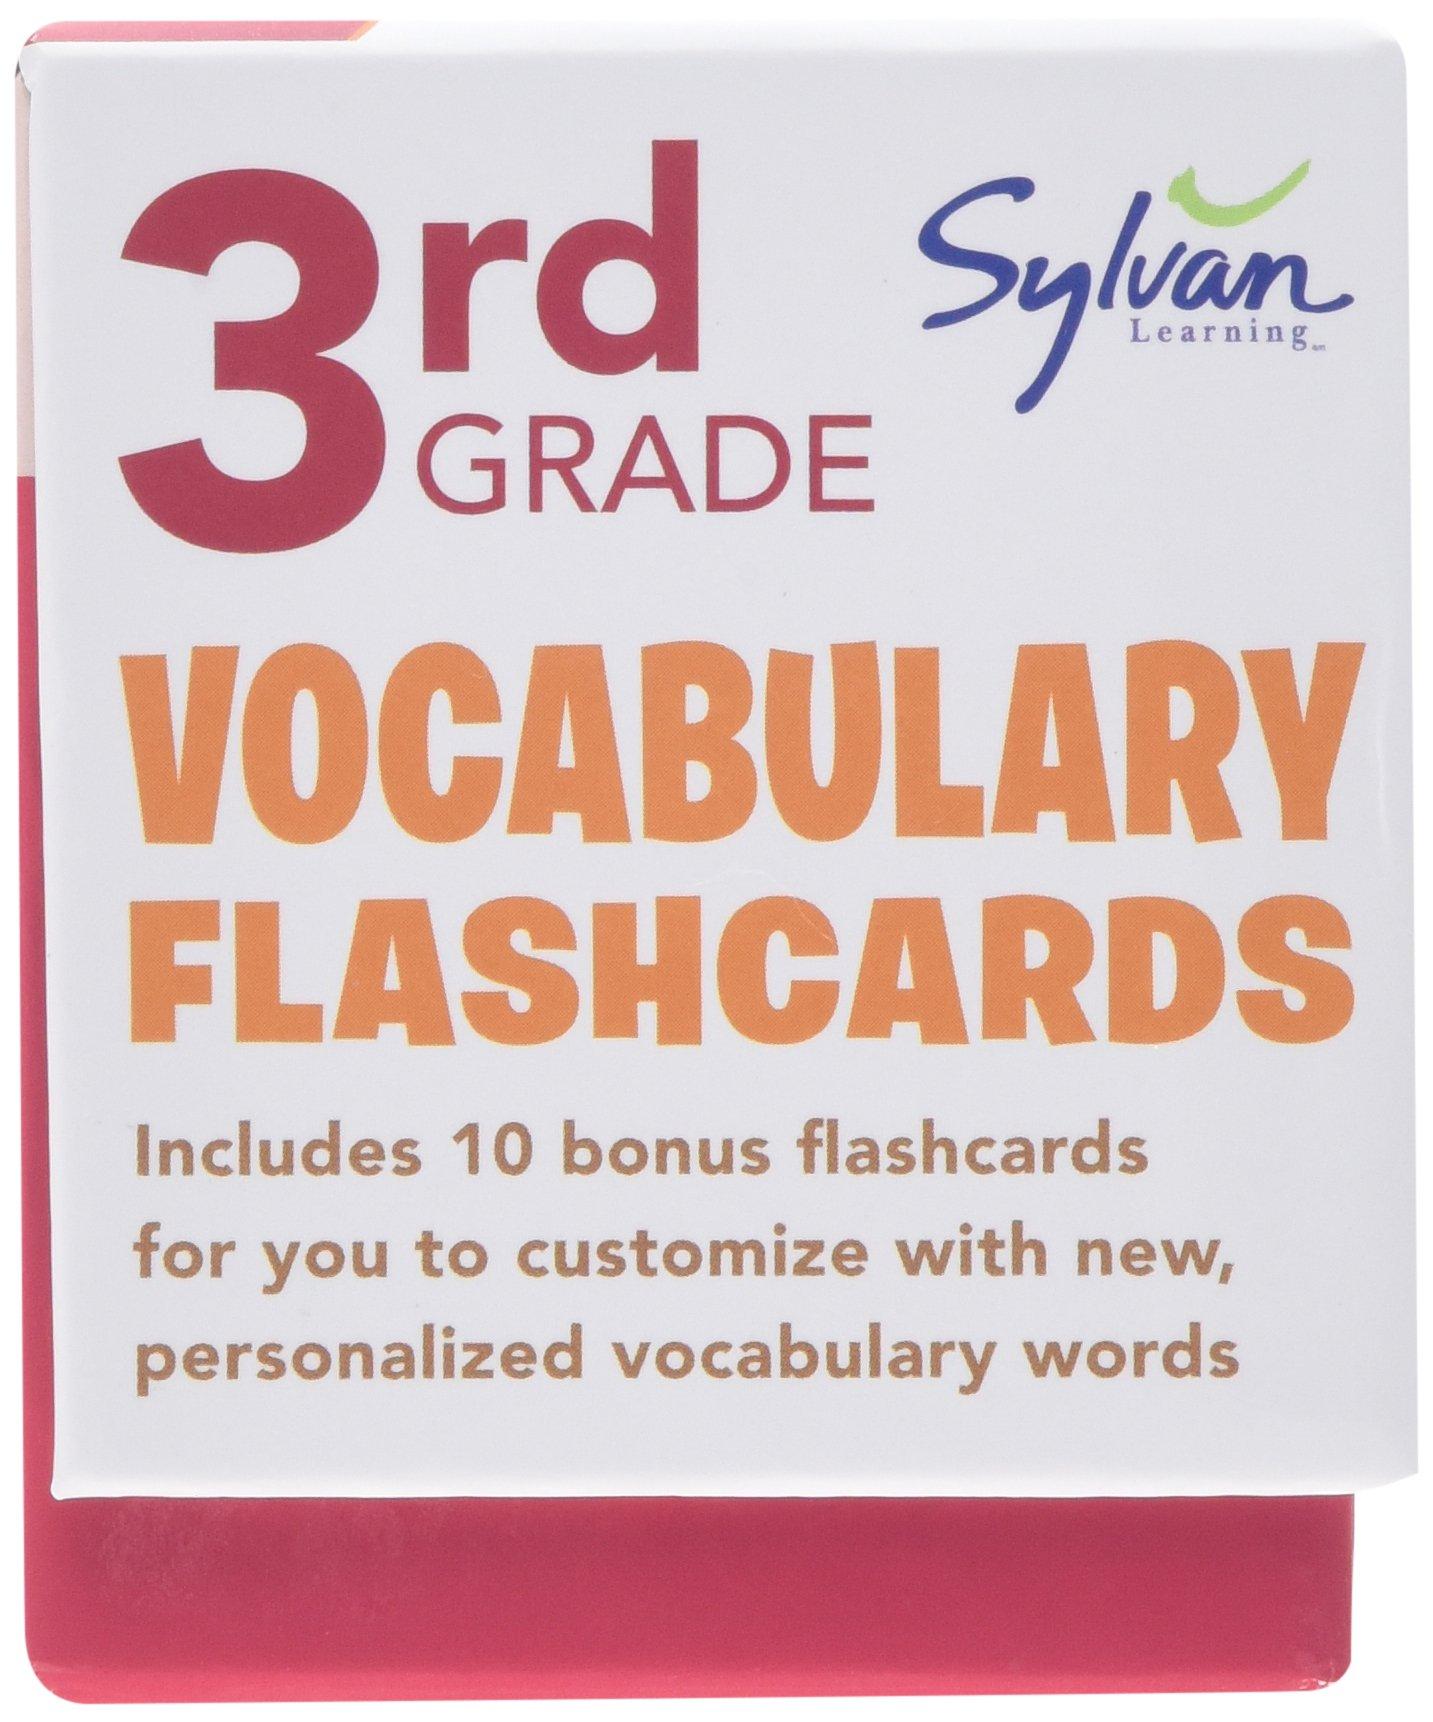 Amazoncom 3rd Grade Vocabulary Flashcards 240 Flashcards For